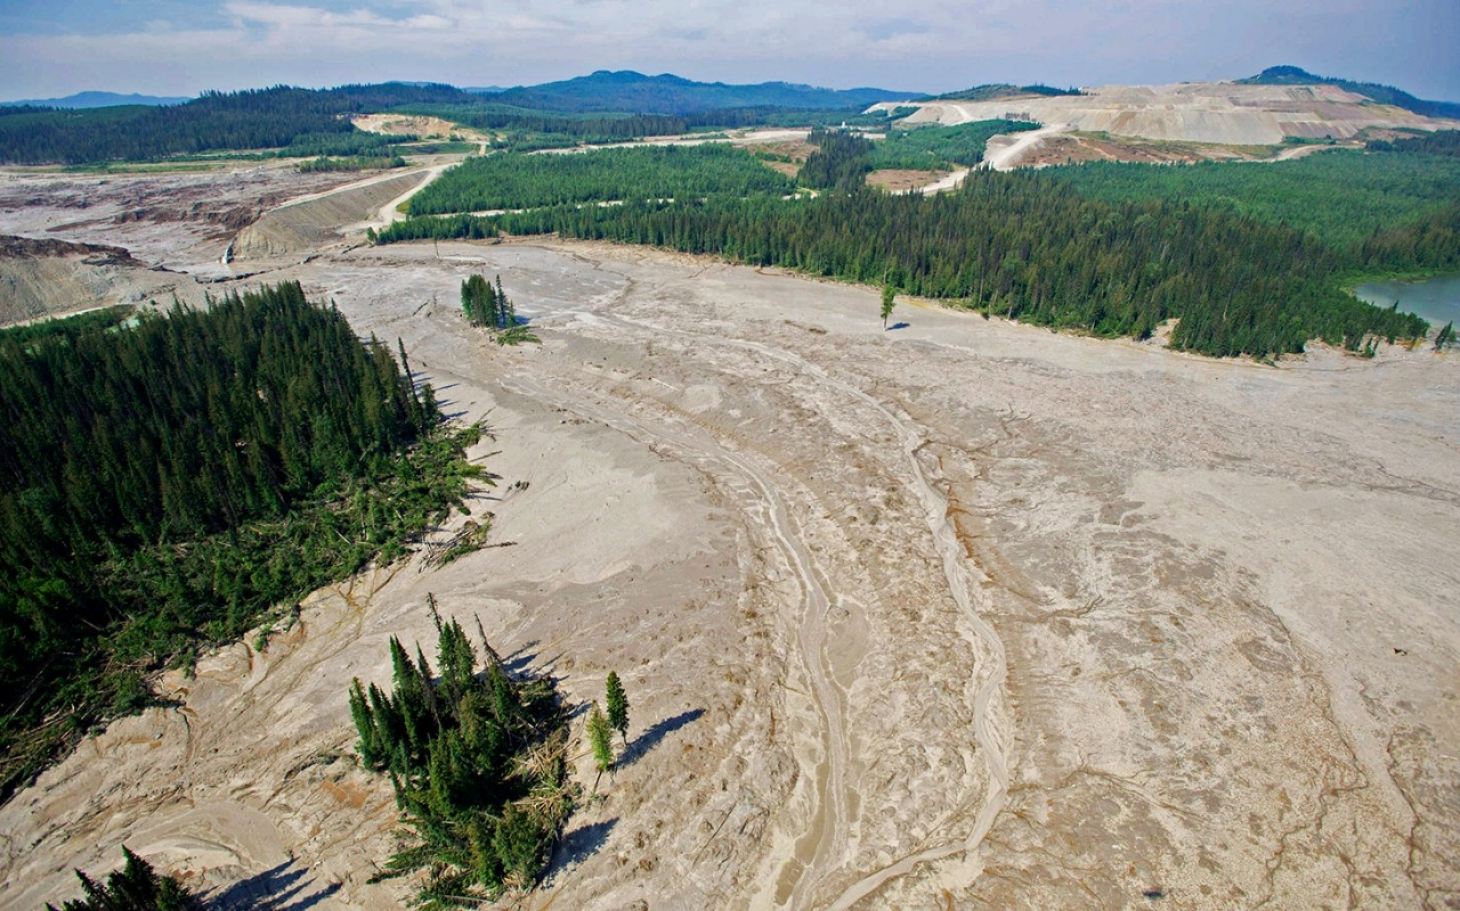 Wastewater Spill Shuts Down Colorado River  Al Jazeera America